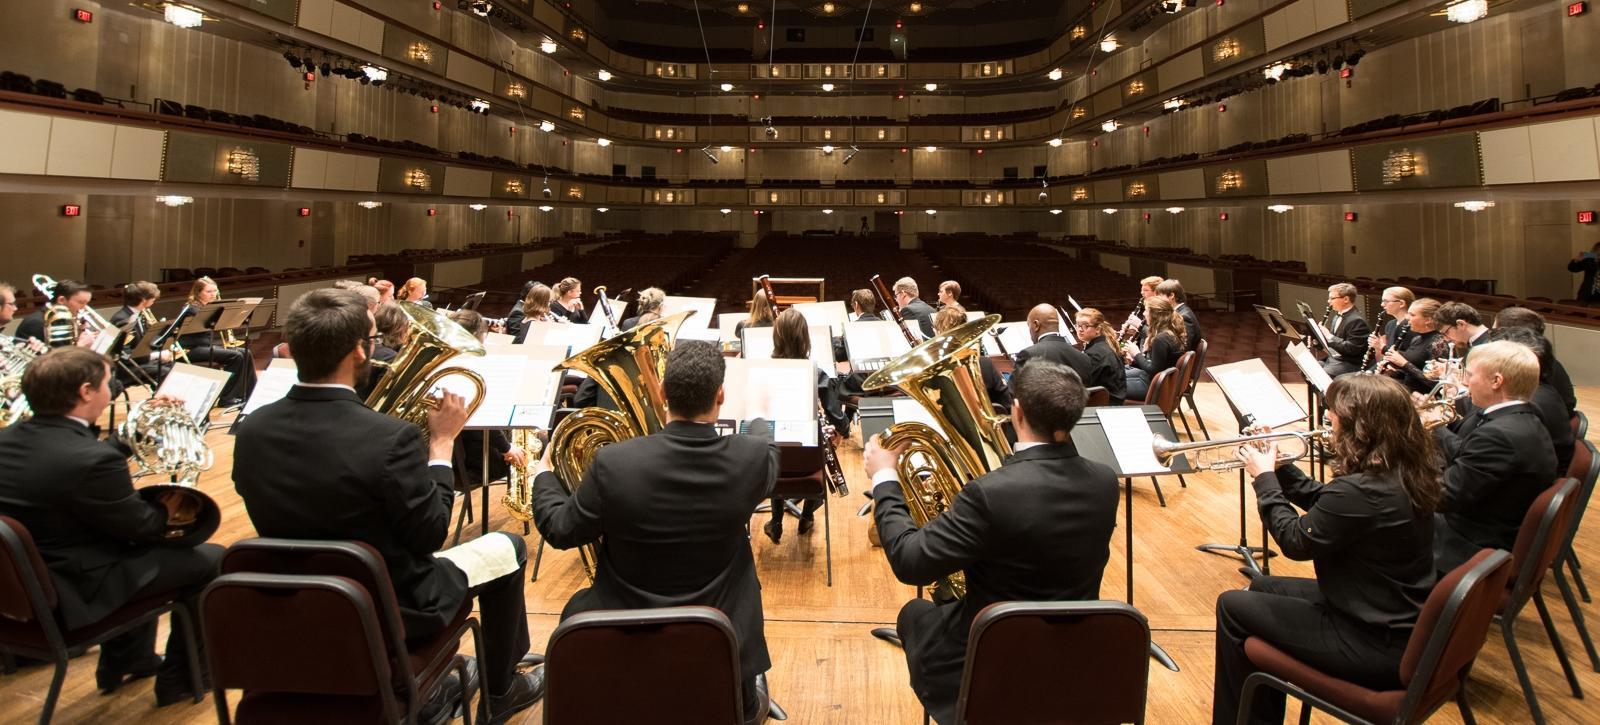 MSU Wind Symphony at the Kennedy Center